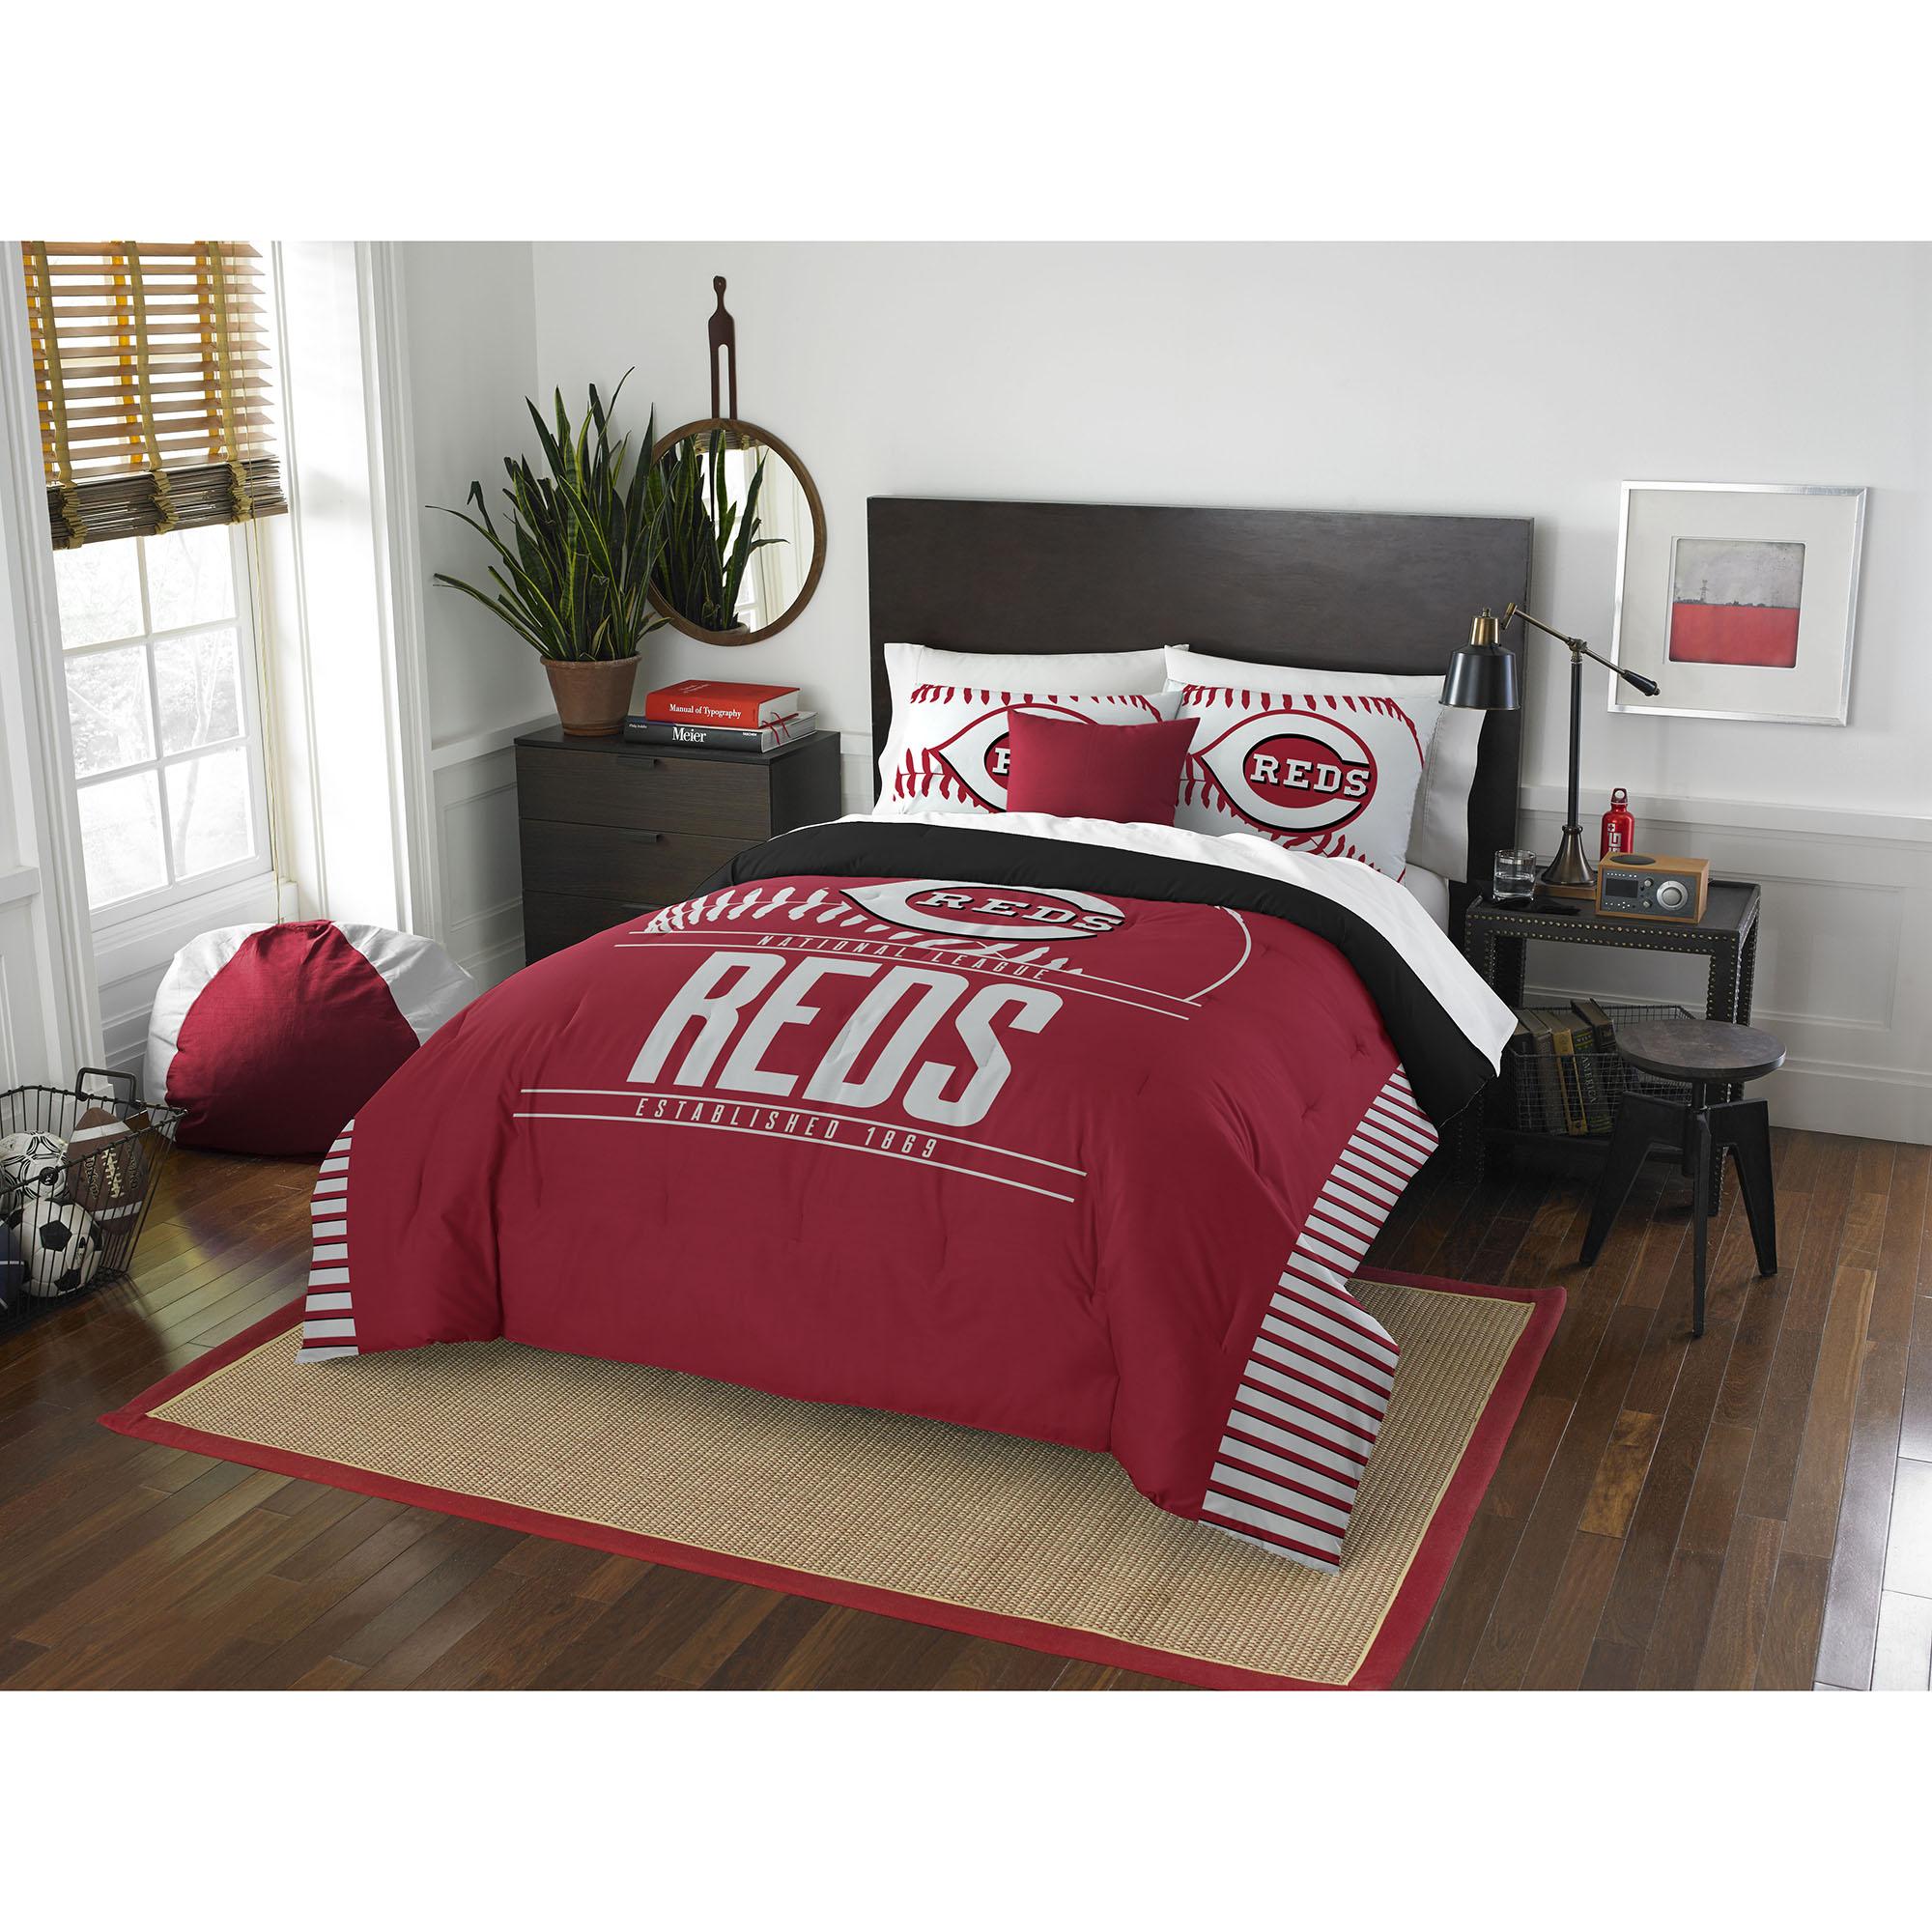 Cincinnati Reds The Northwest Company Grand Slam Full/Queen Comforter Set - No Size